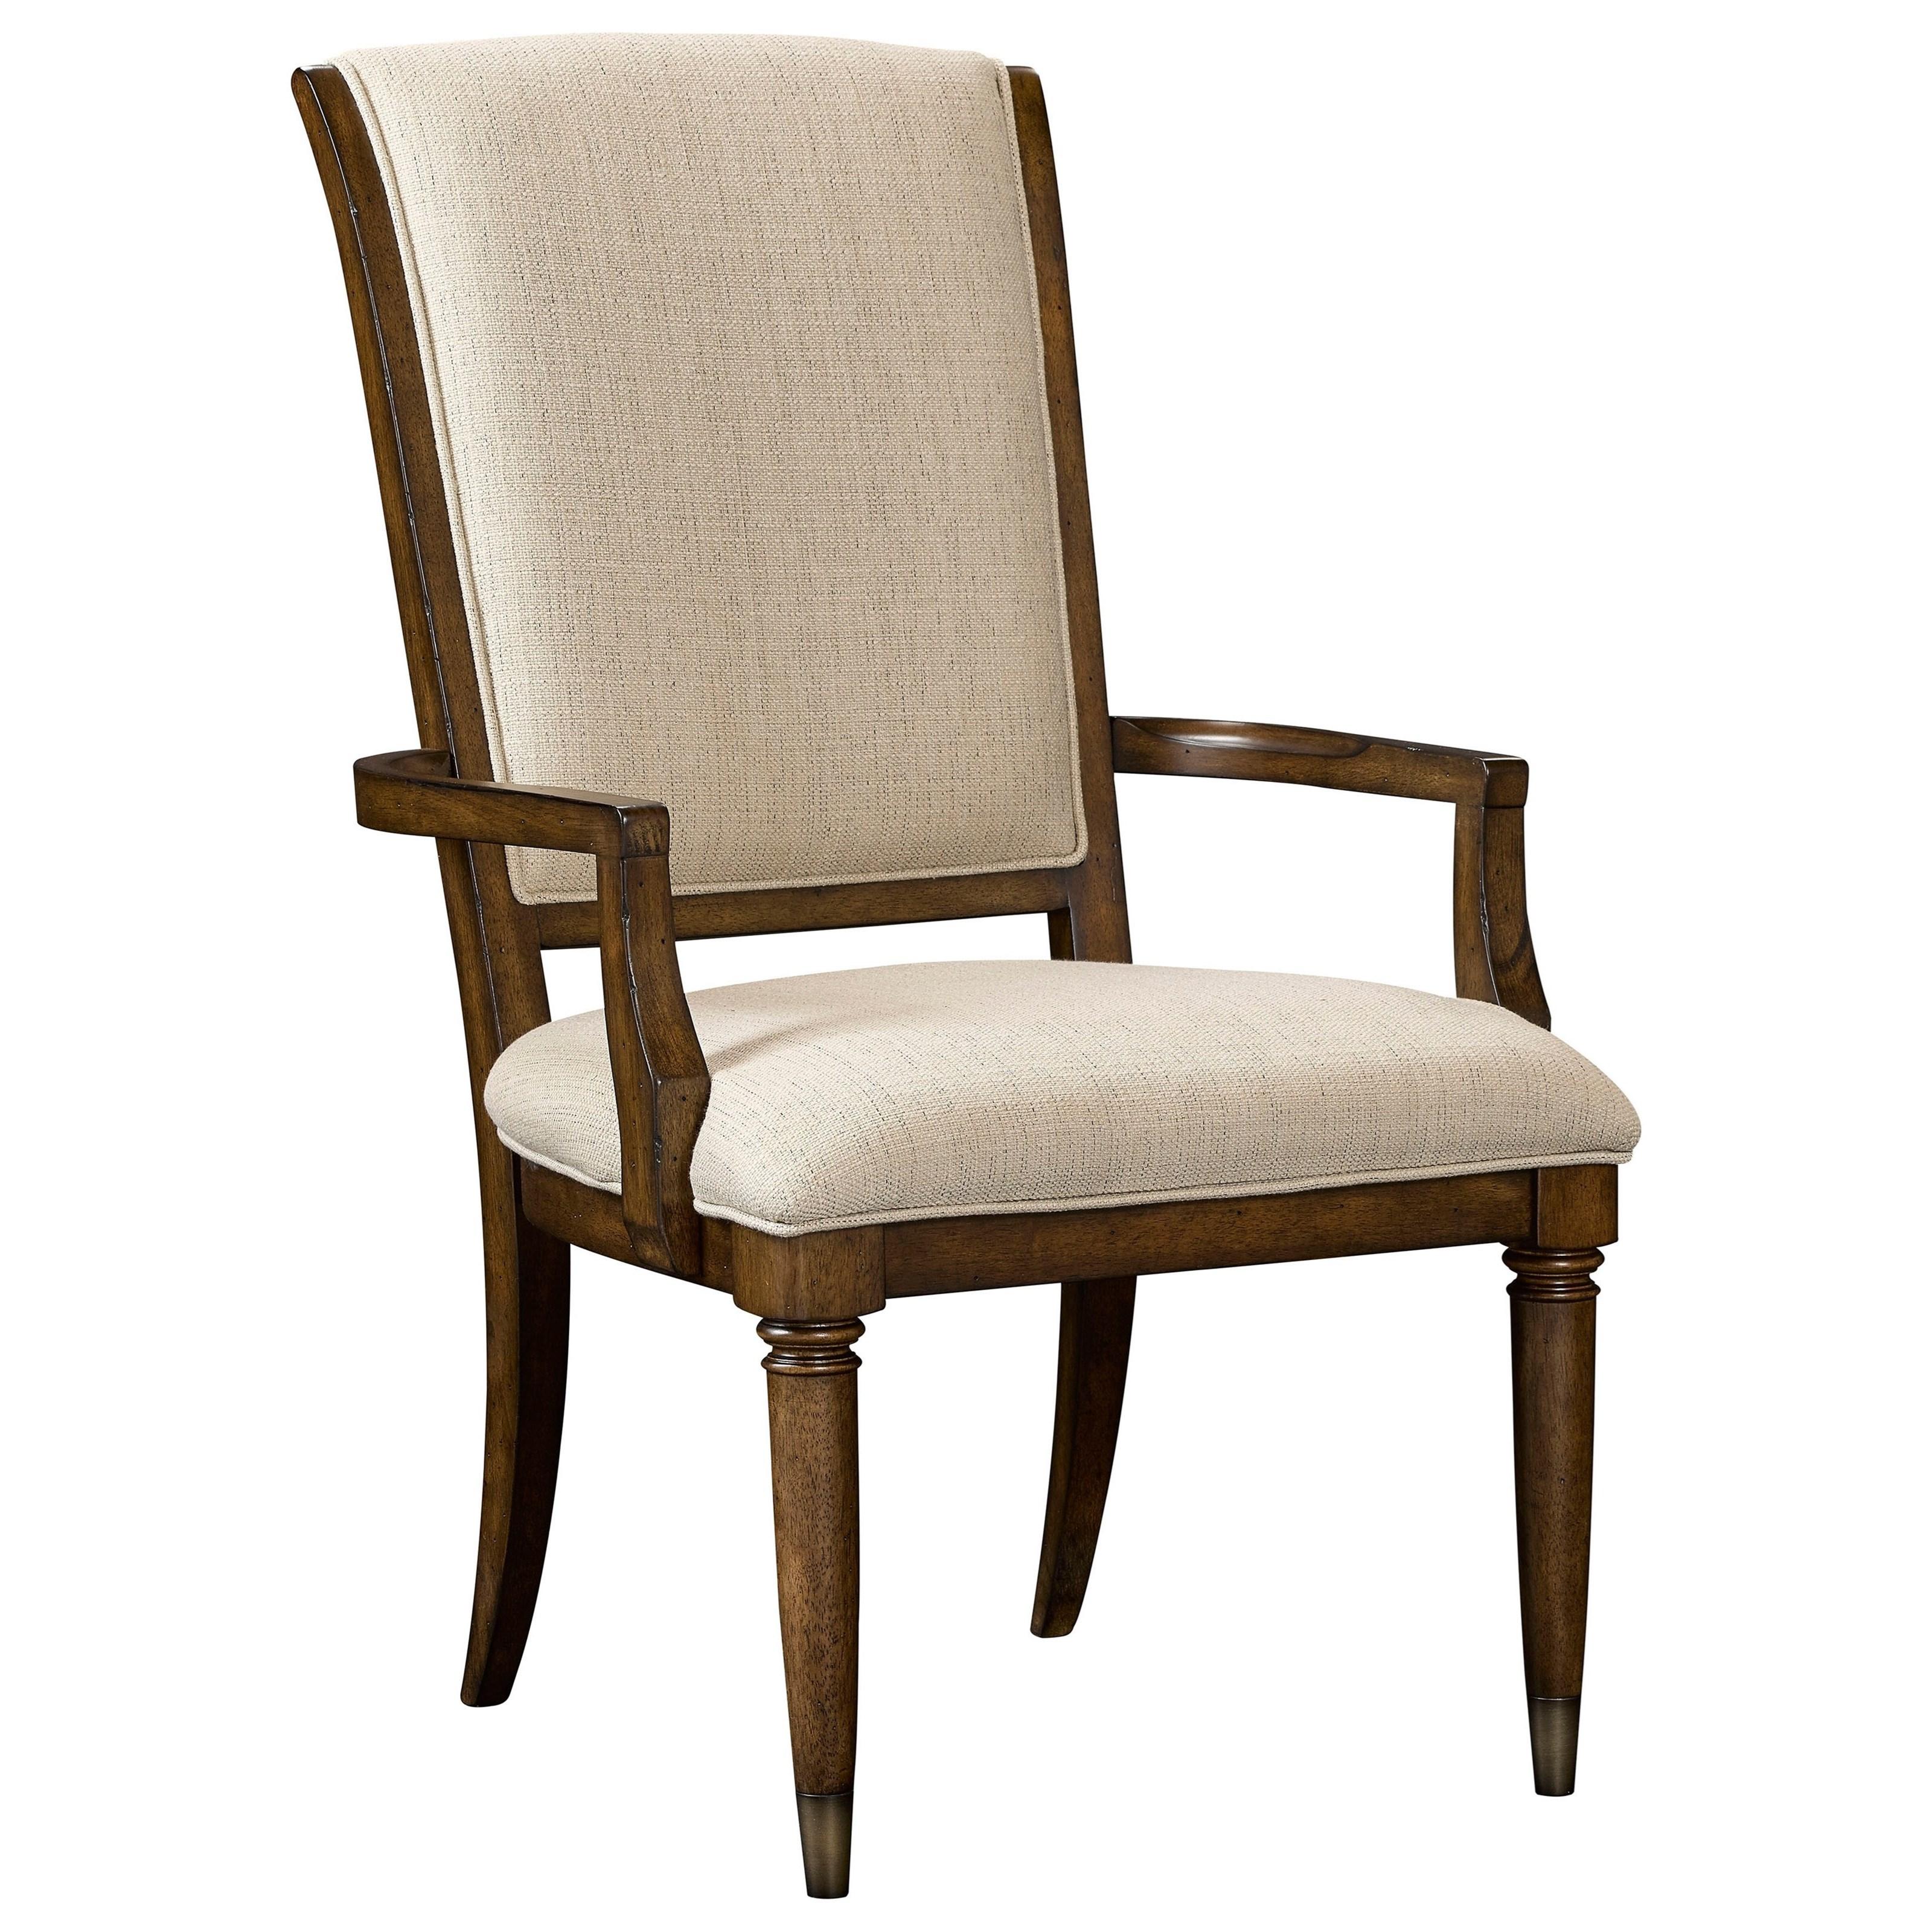 Genial Thomasville® SomersetNorton Upholstered Arm Chair ...